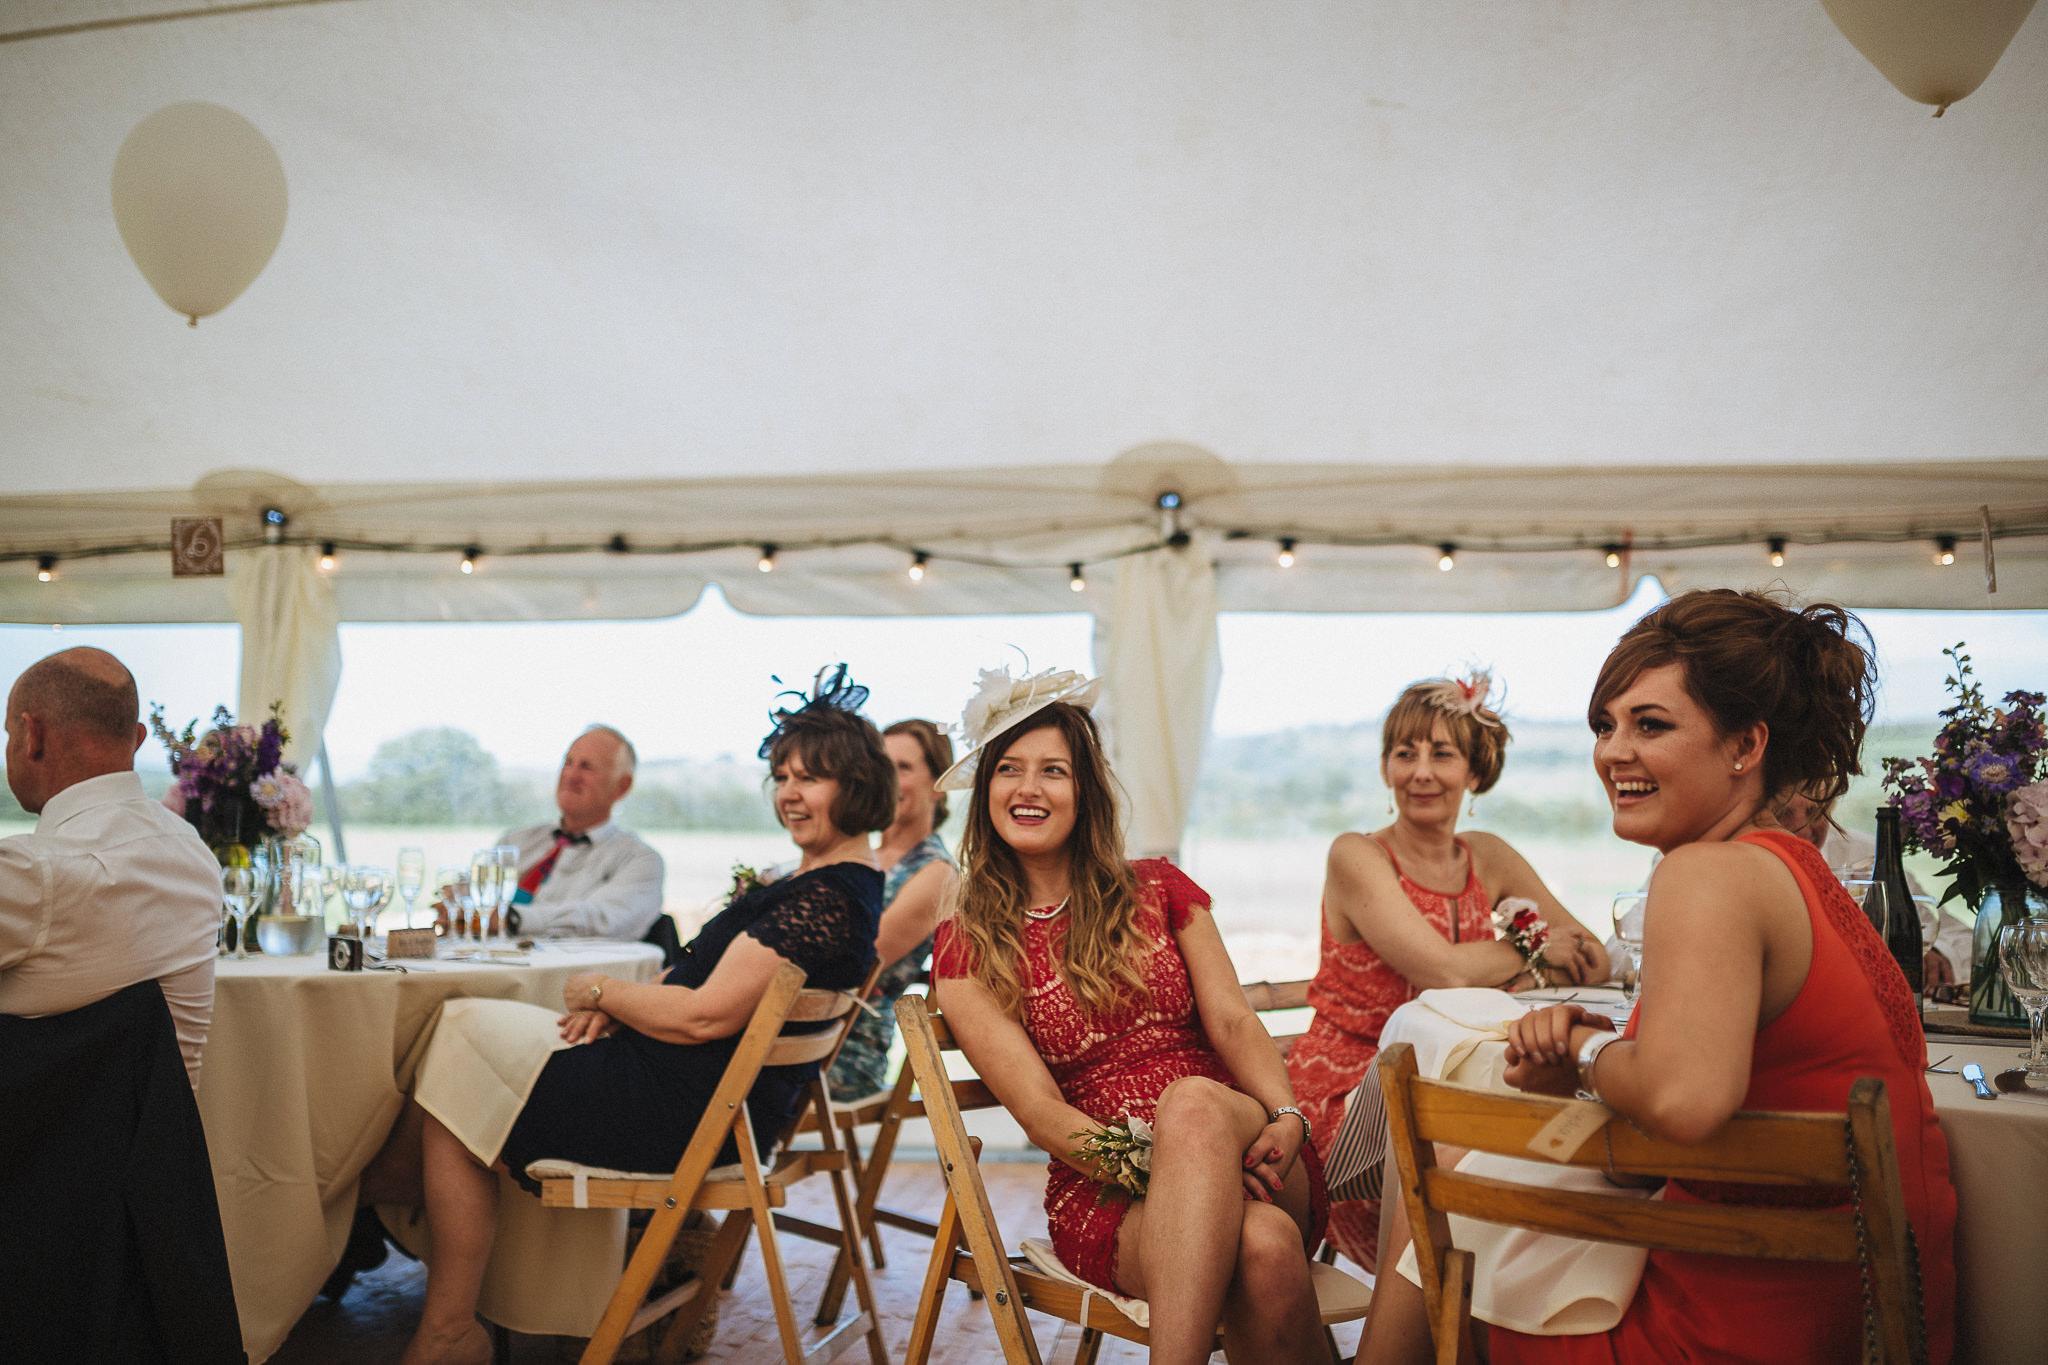 paul-marbrook-Farm-Wedding-Photographer-Lancashire-90055